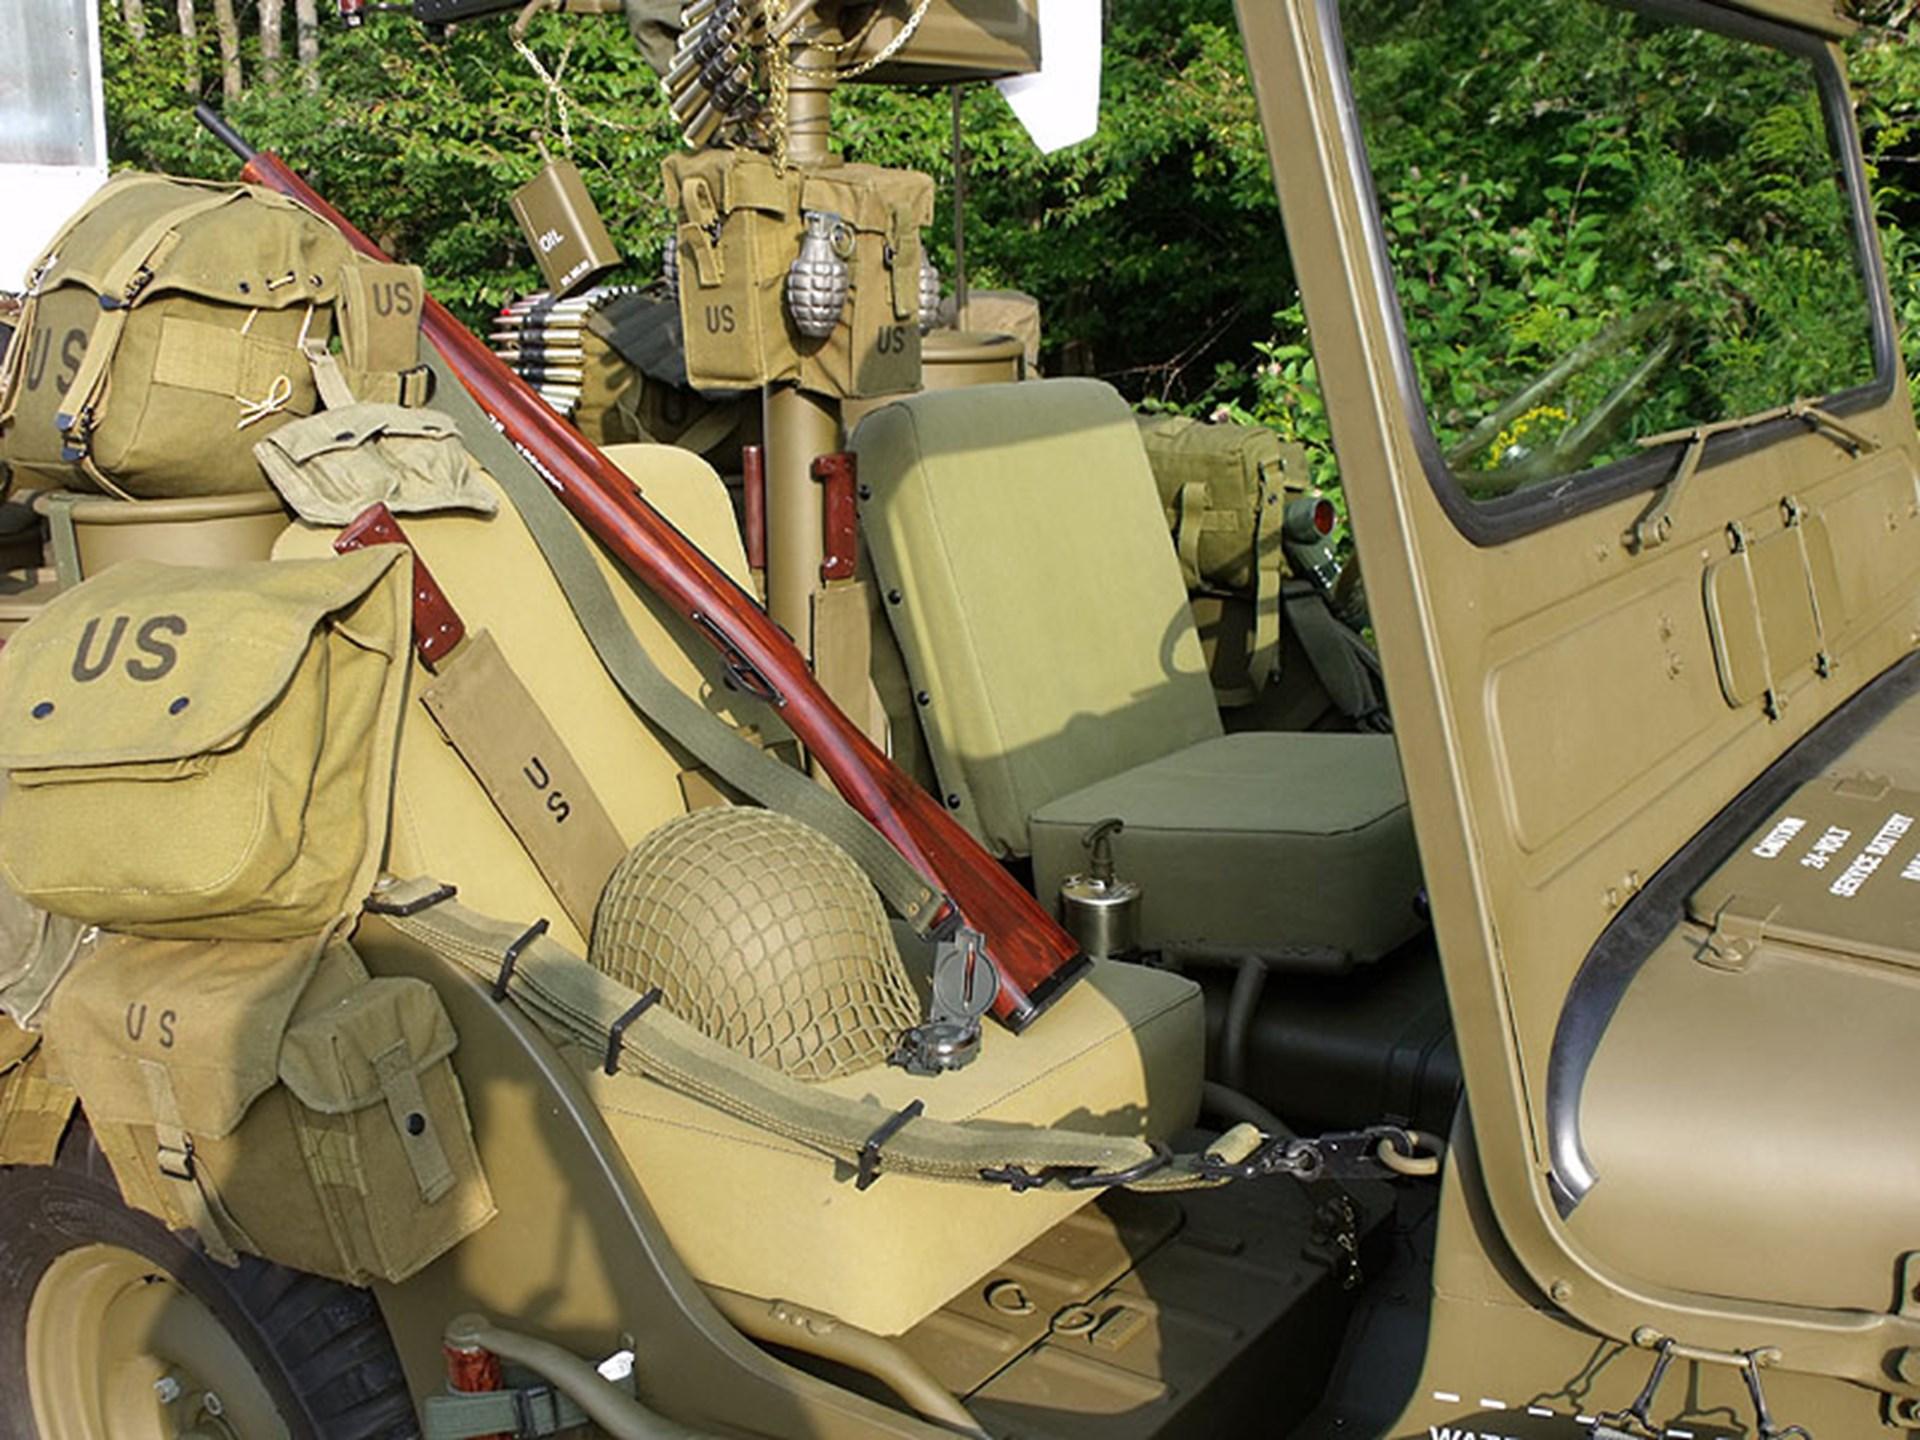 Rm Sothebys 1952 Willys M38 Korean War Military Jeep Hershey 2011 Rear Seat